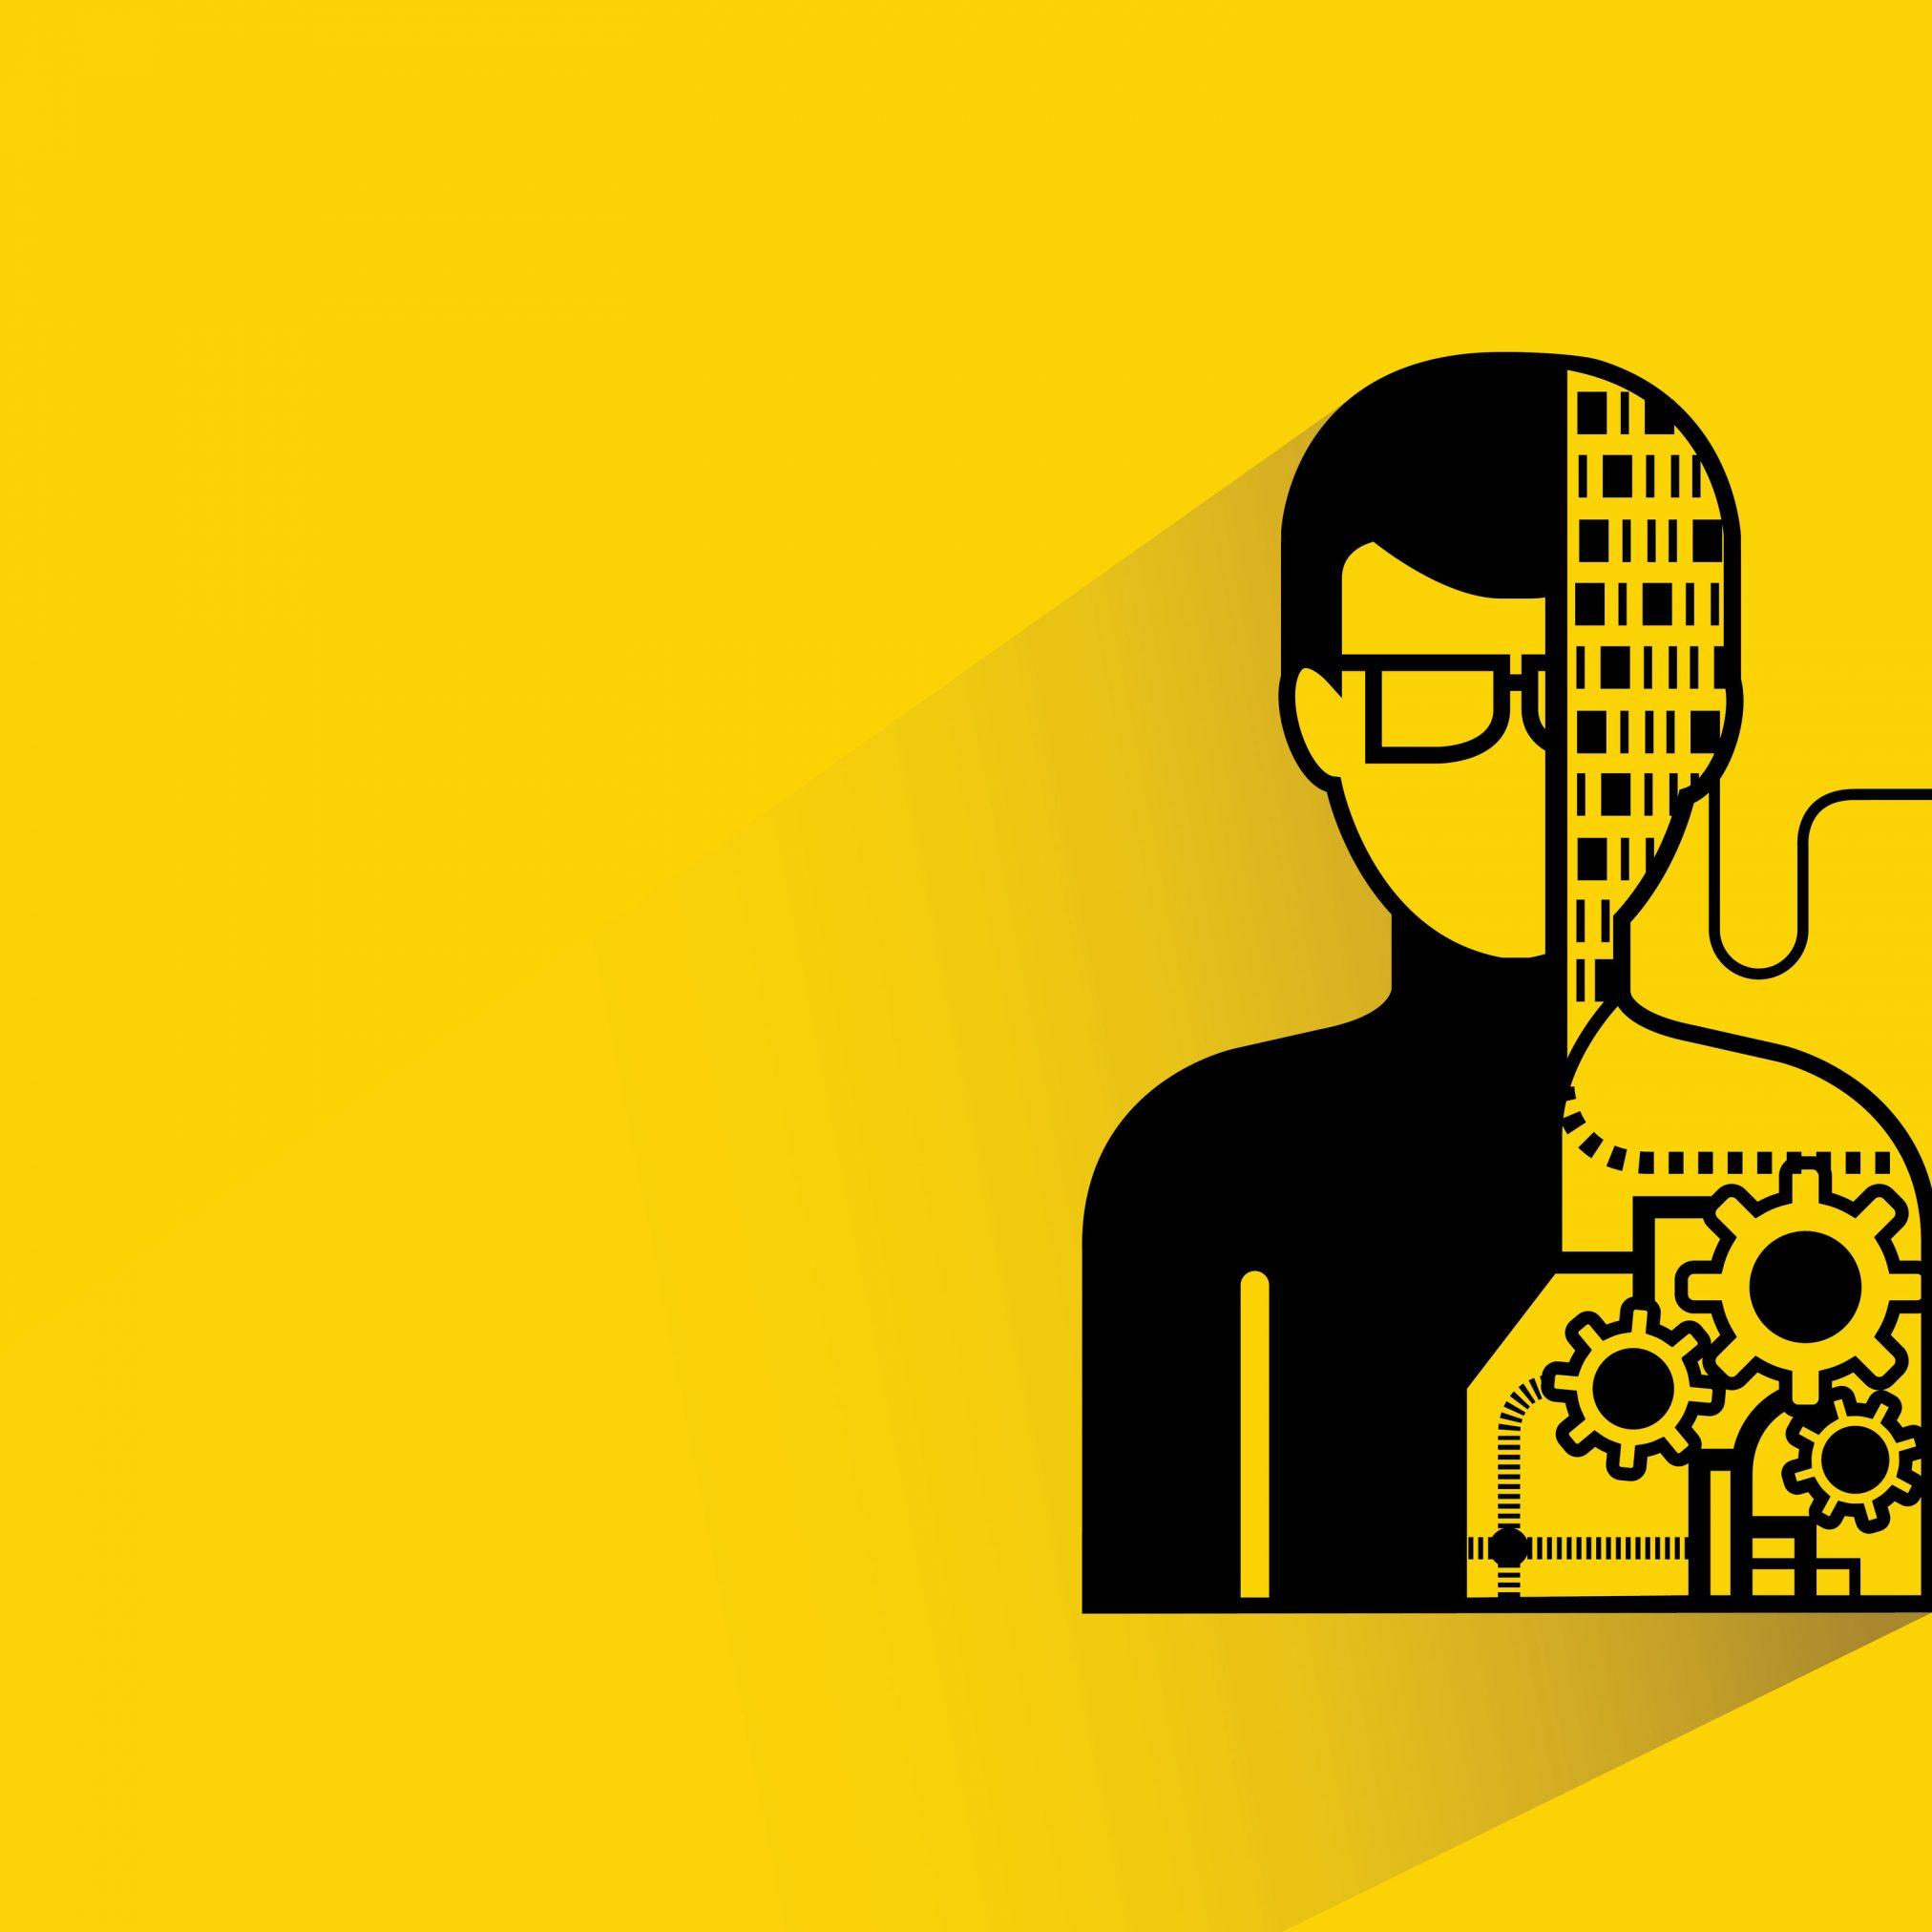 robot technology workforce automation